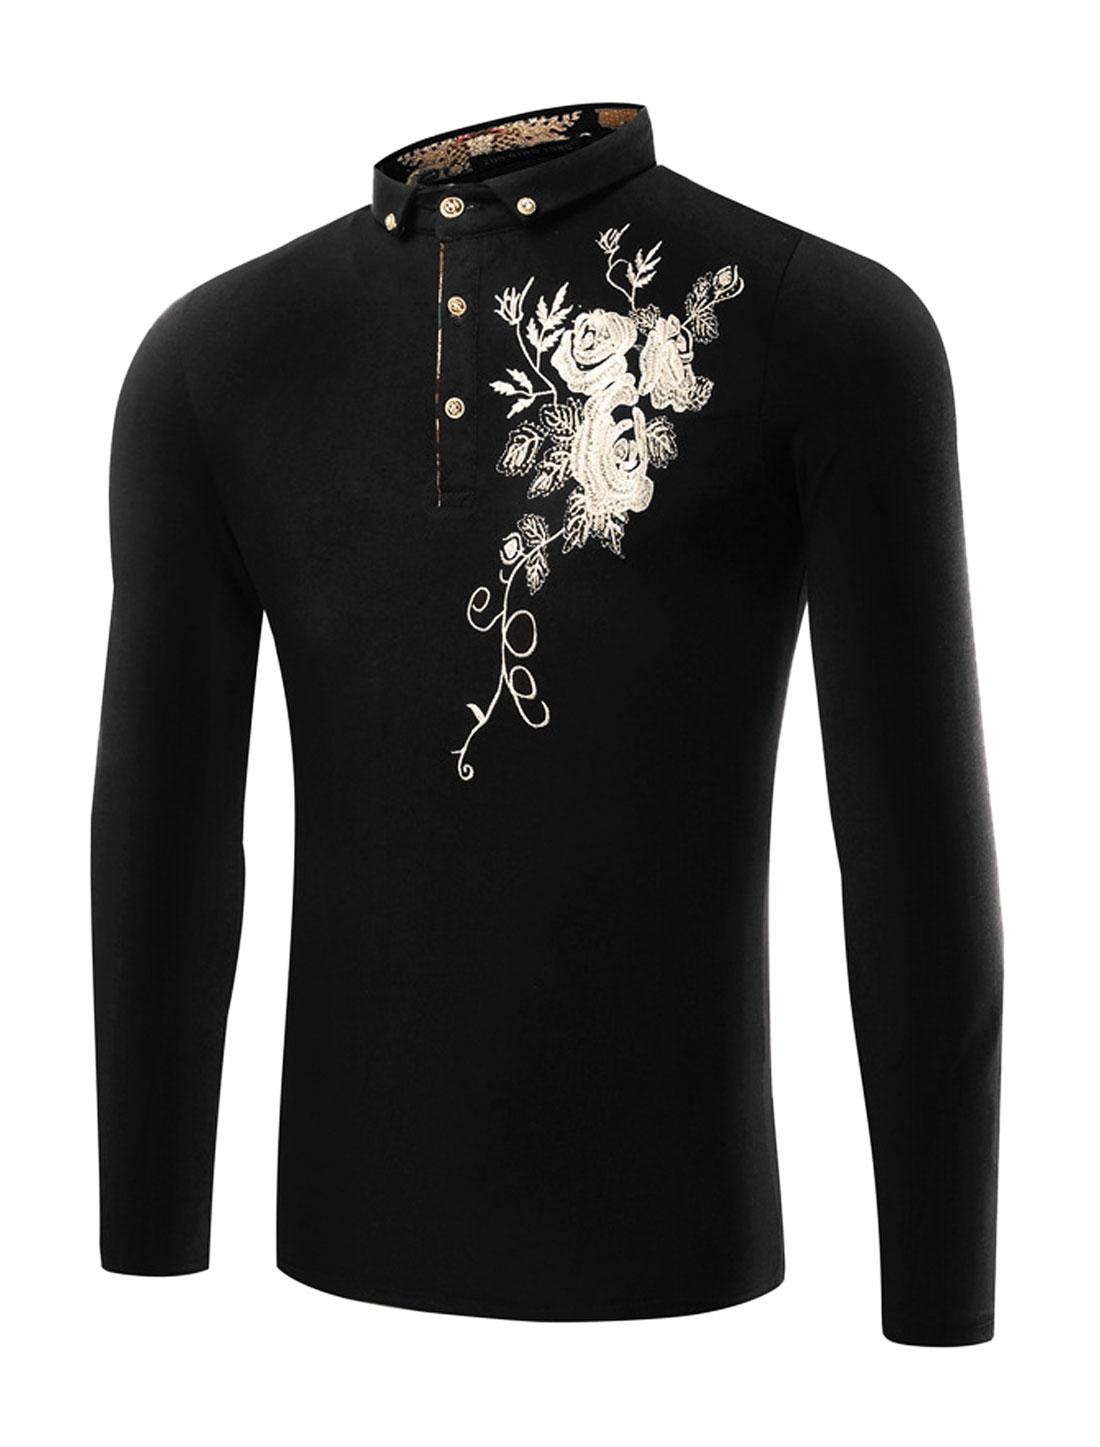 Men Rhinestones Decor Floral Embroidery T-Shirt Black M